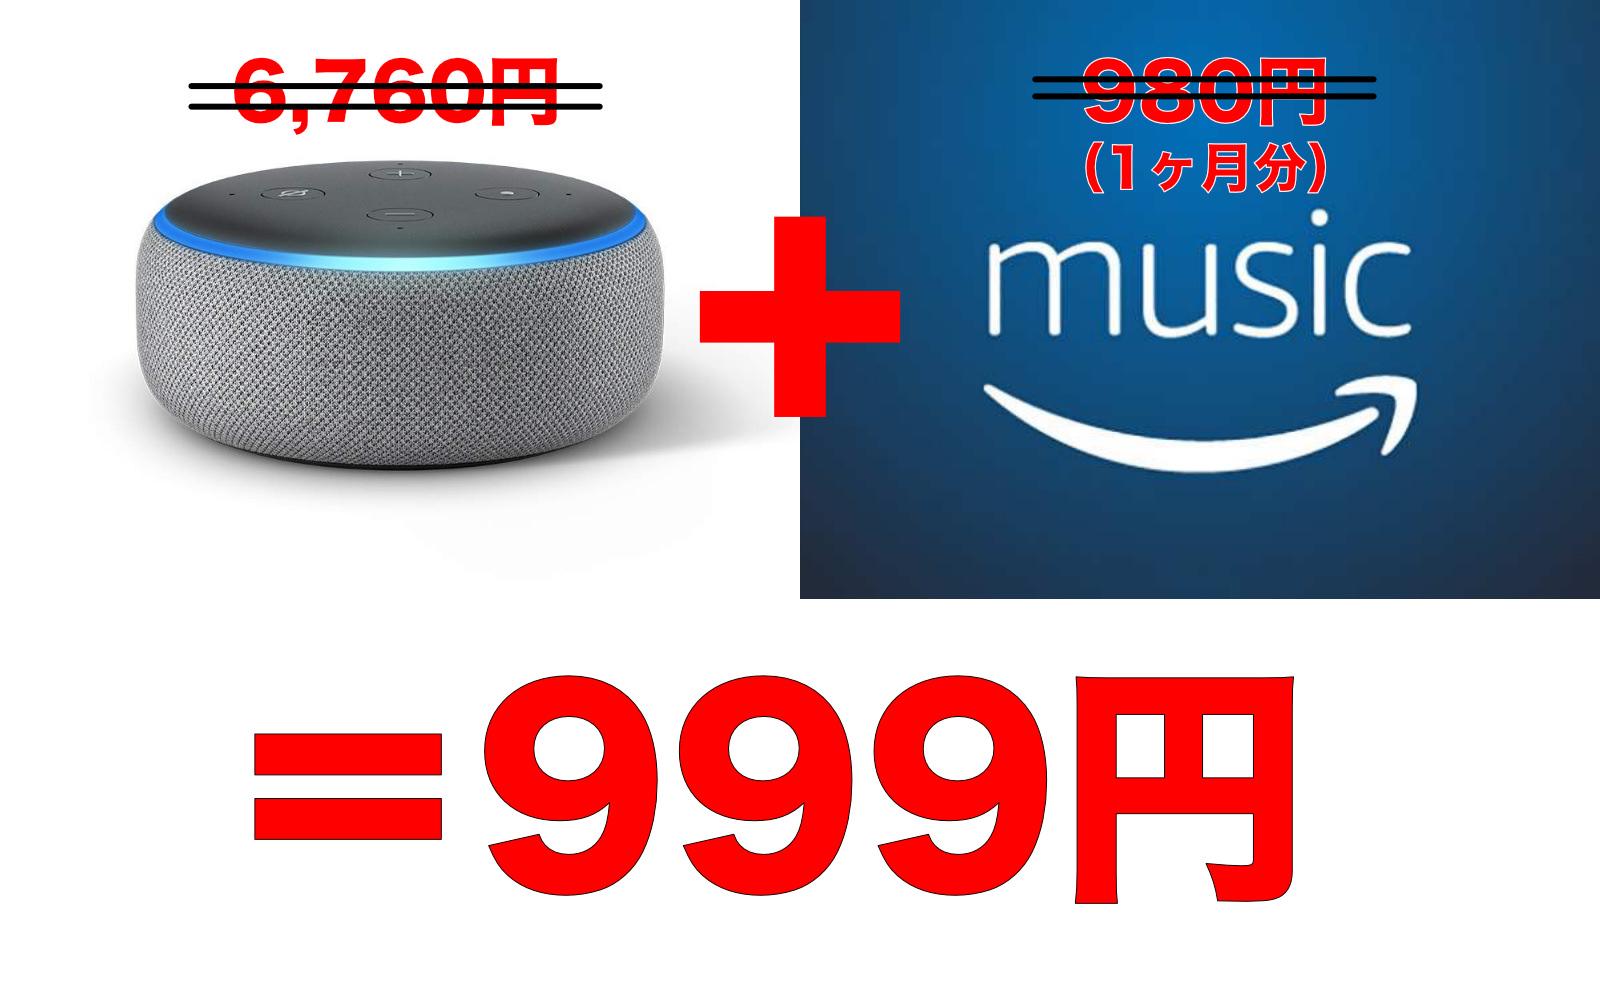 Amazon-Echo-Sale-999yen